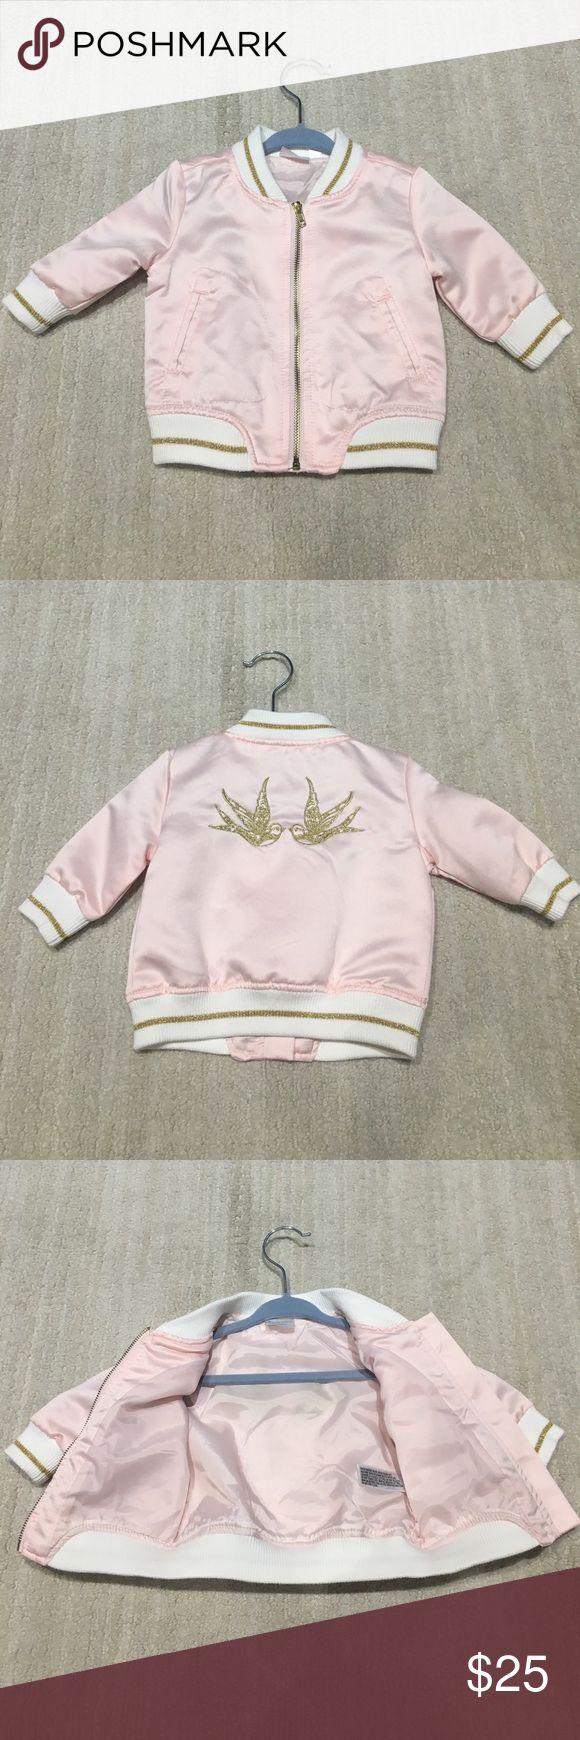 Kardashian Kids Pink Baby's Bomber Jacket Kardashian Kids Pink Baby's Bomber Jacket Kardashian Kids Jackets & Coats